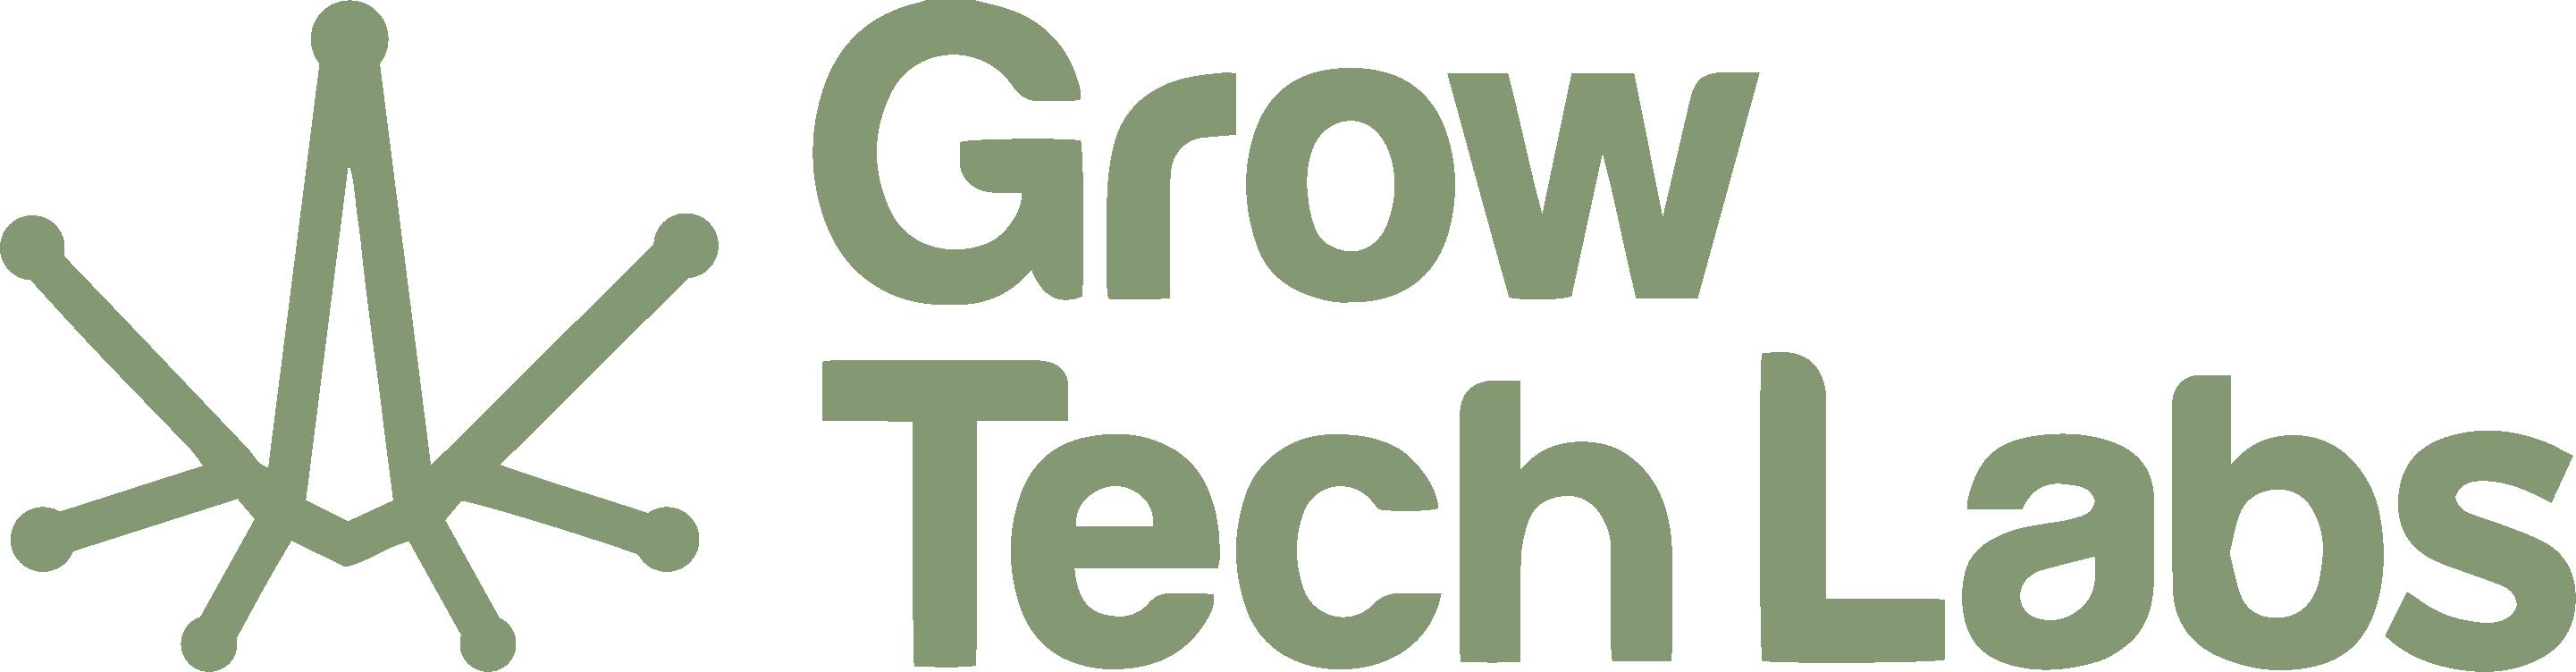 Vibe Life Kombucha's CBD line joins cannabis business accelerator Grow Tech Labs' consumables cohort division